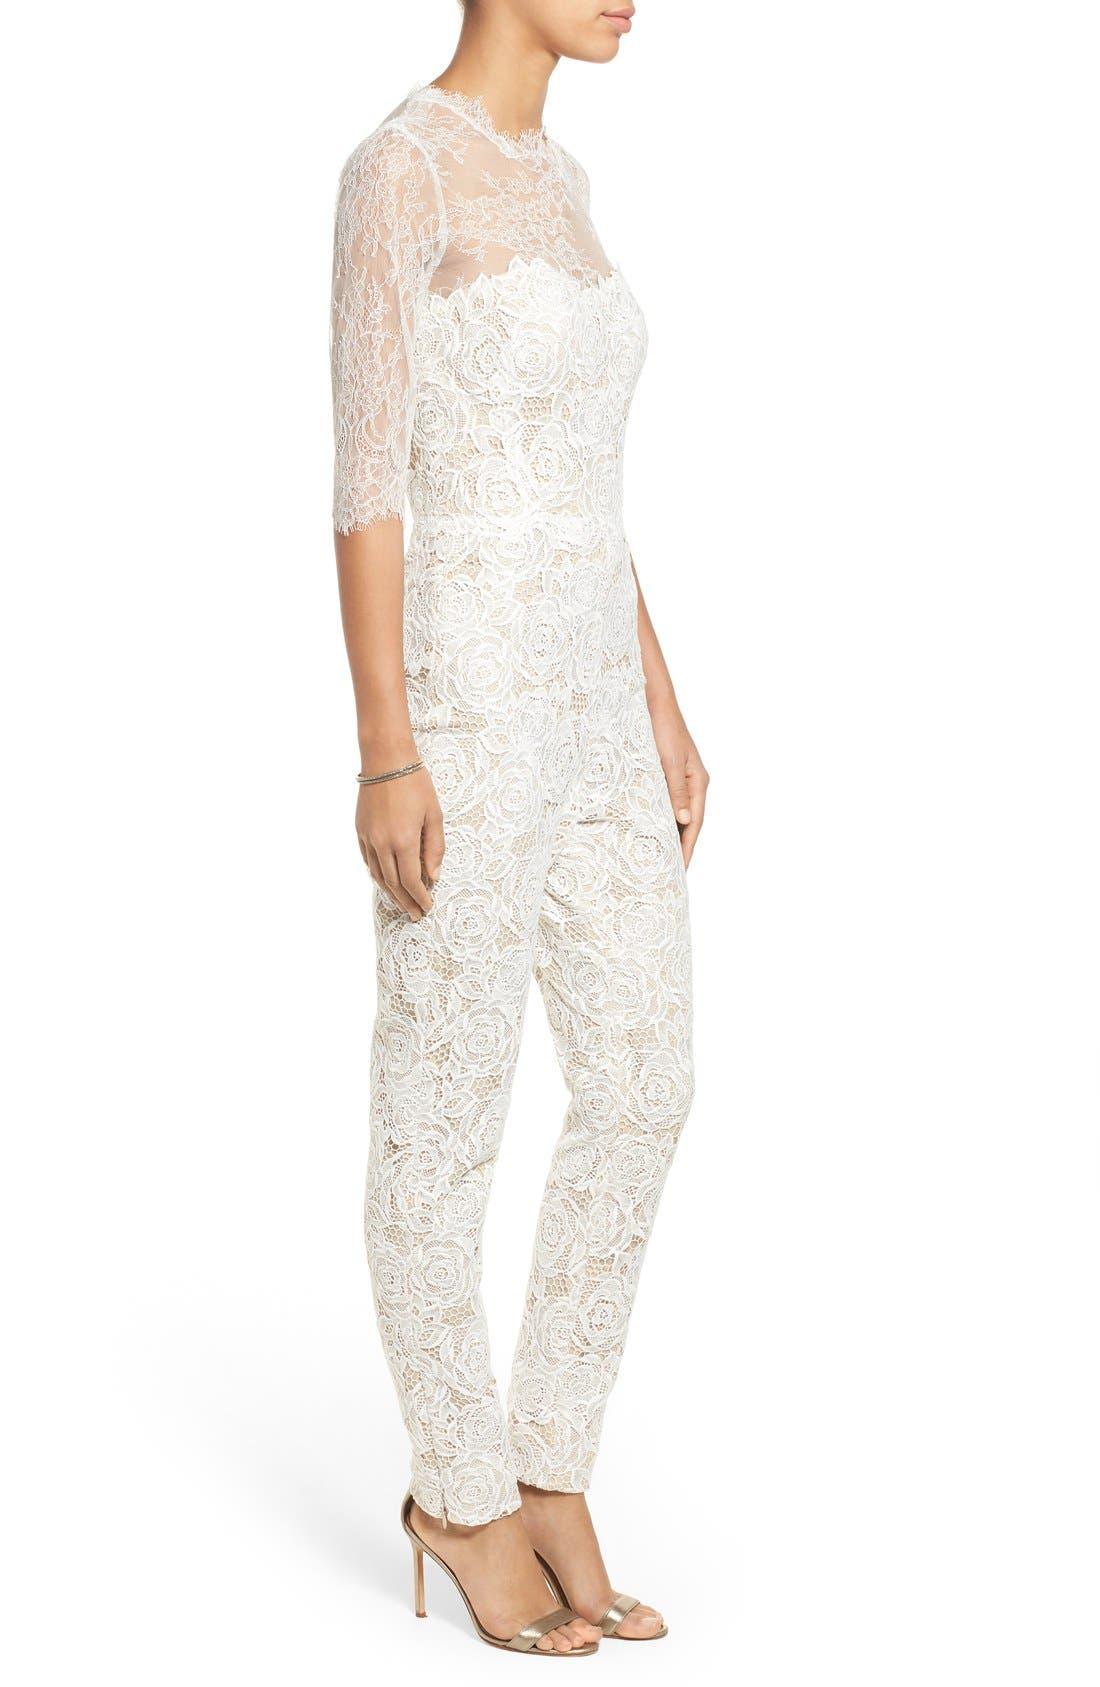 Monique Lhuillier Ready to Wed Guipure Lace Jumpsuit,                             Alternate thumbnail 3, color,                             Silk White/ Nude